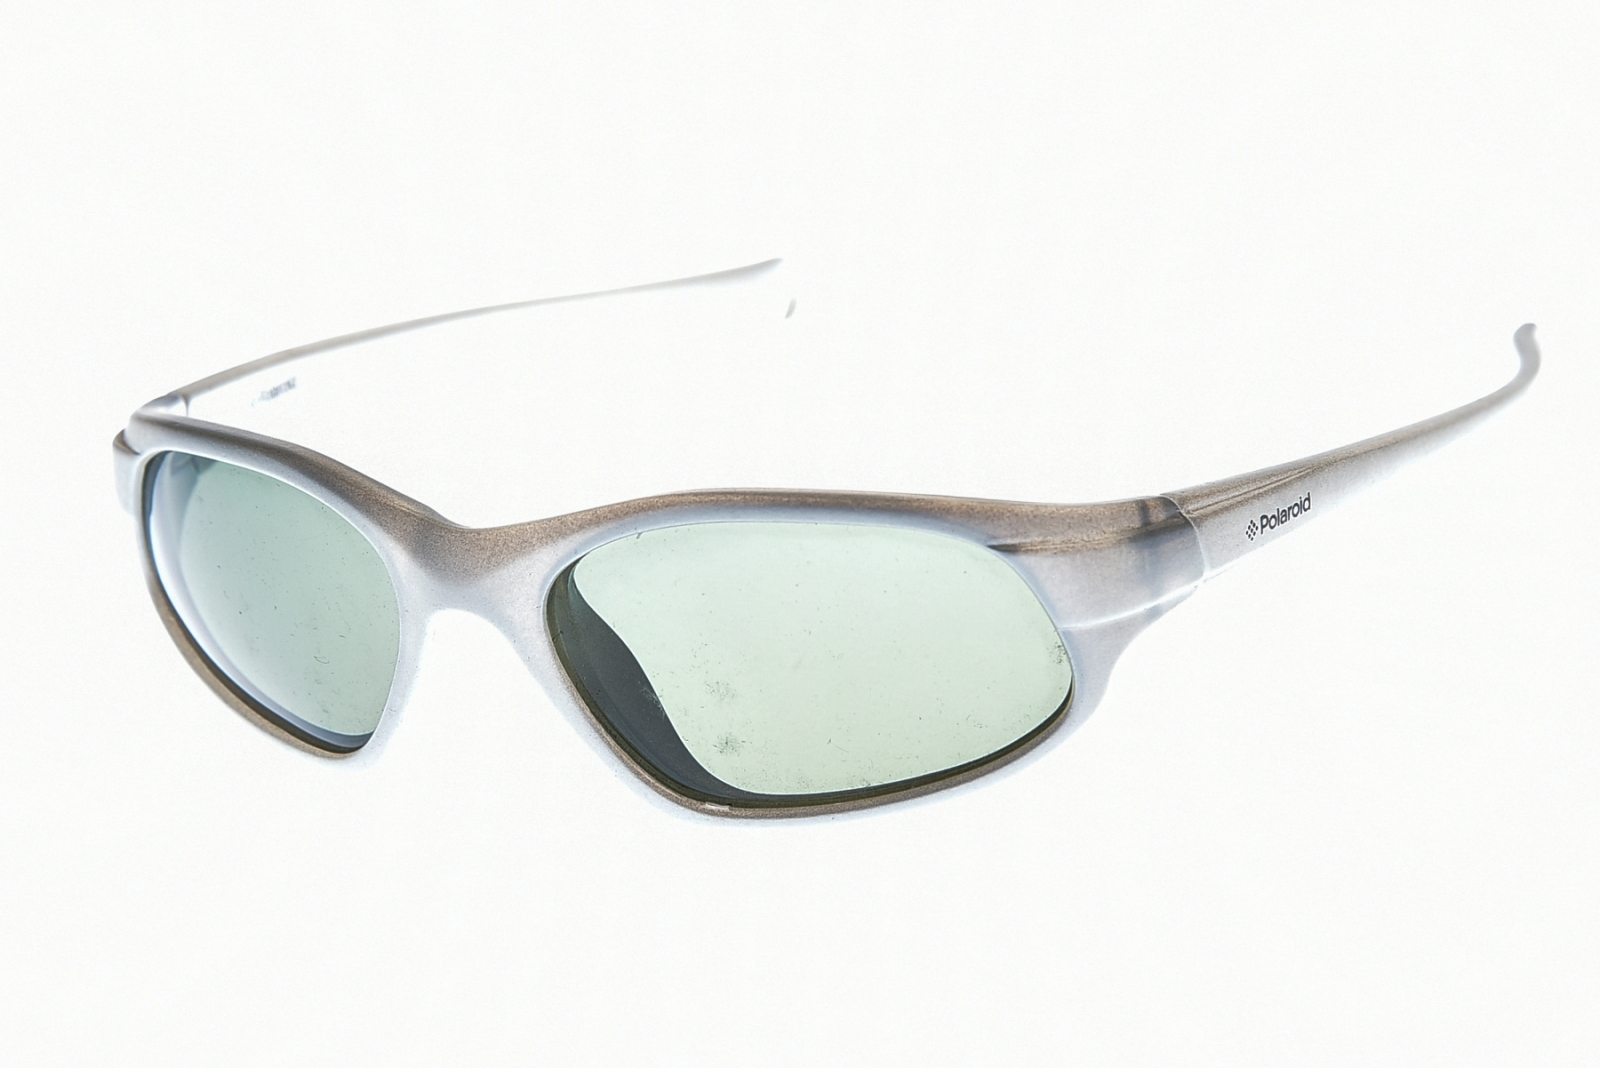 Polaroid Kids' 0742B - Slnečné okuliare pre deti 4-7 r.